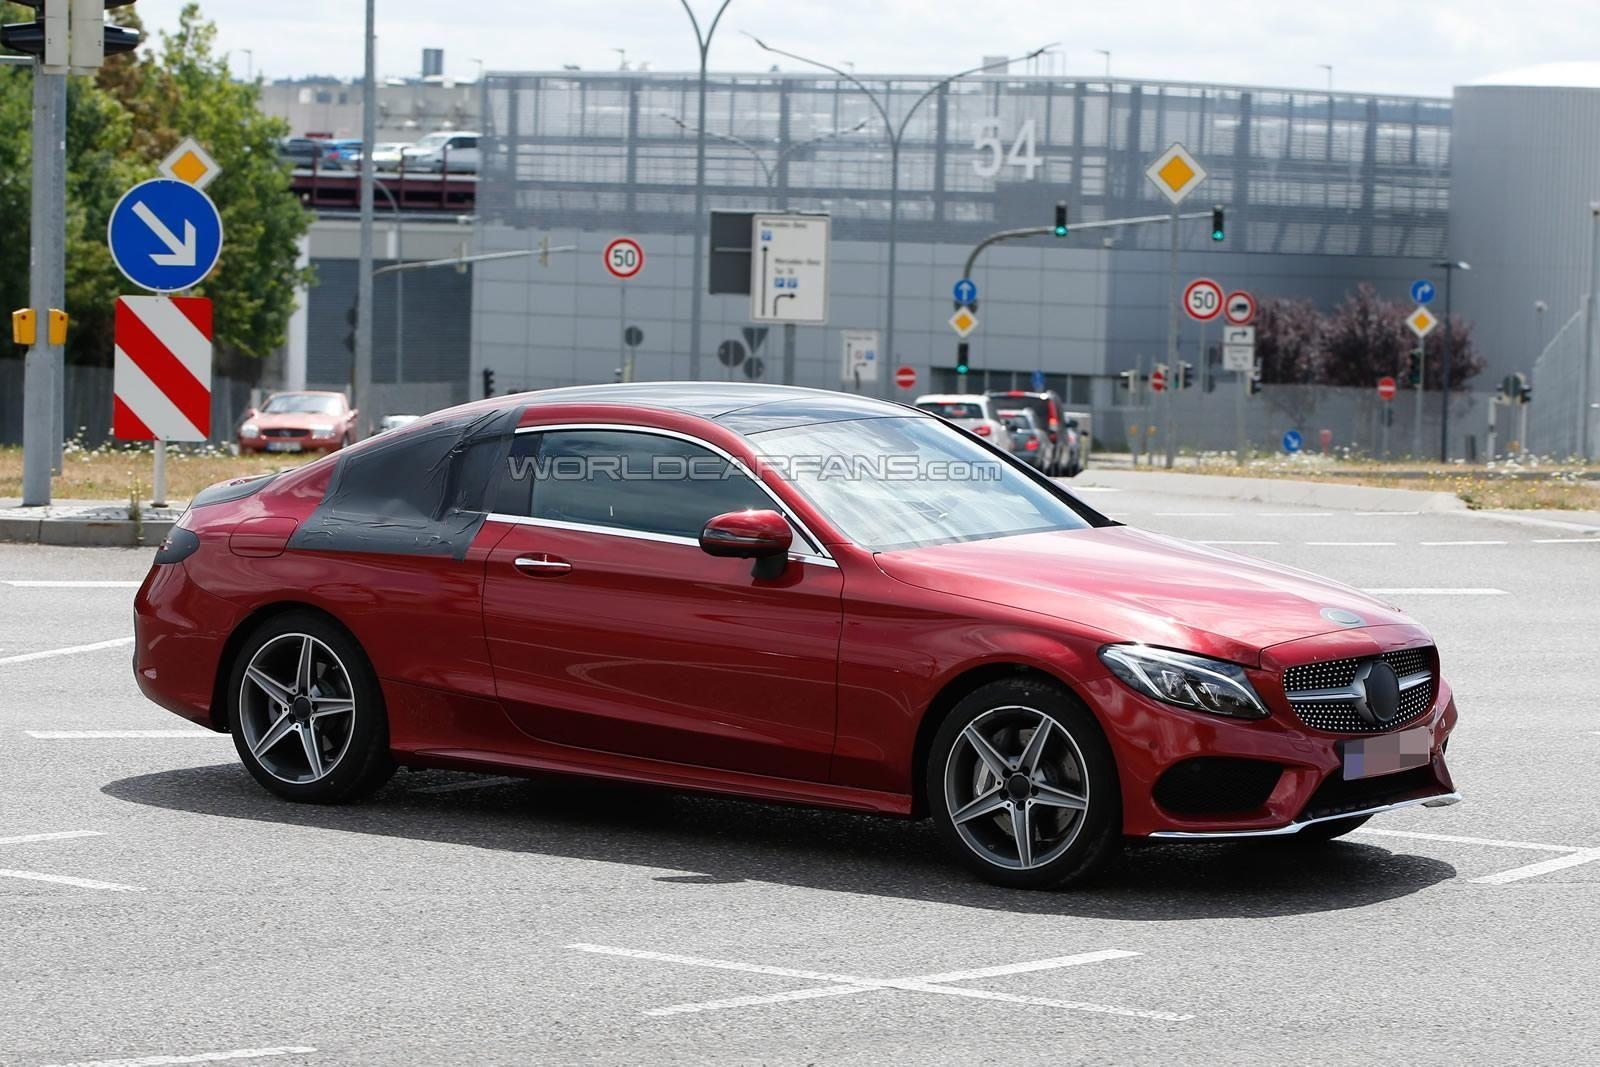 Mercedes-Benz C Coupe spy